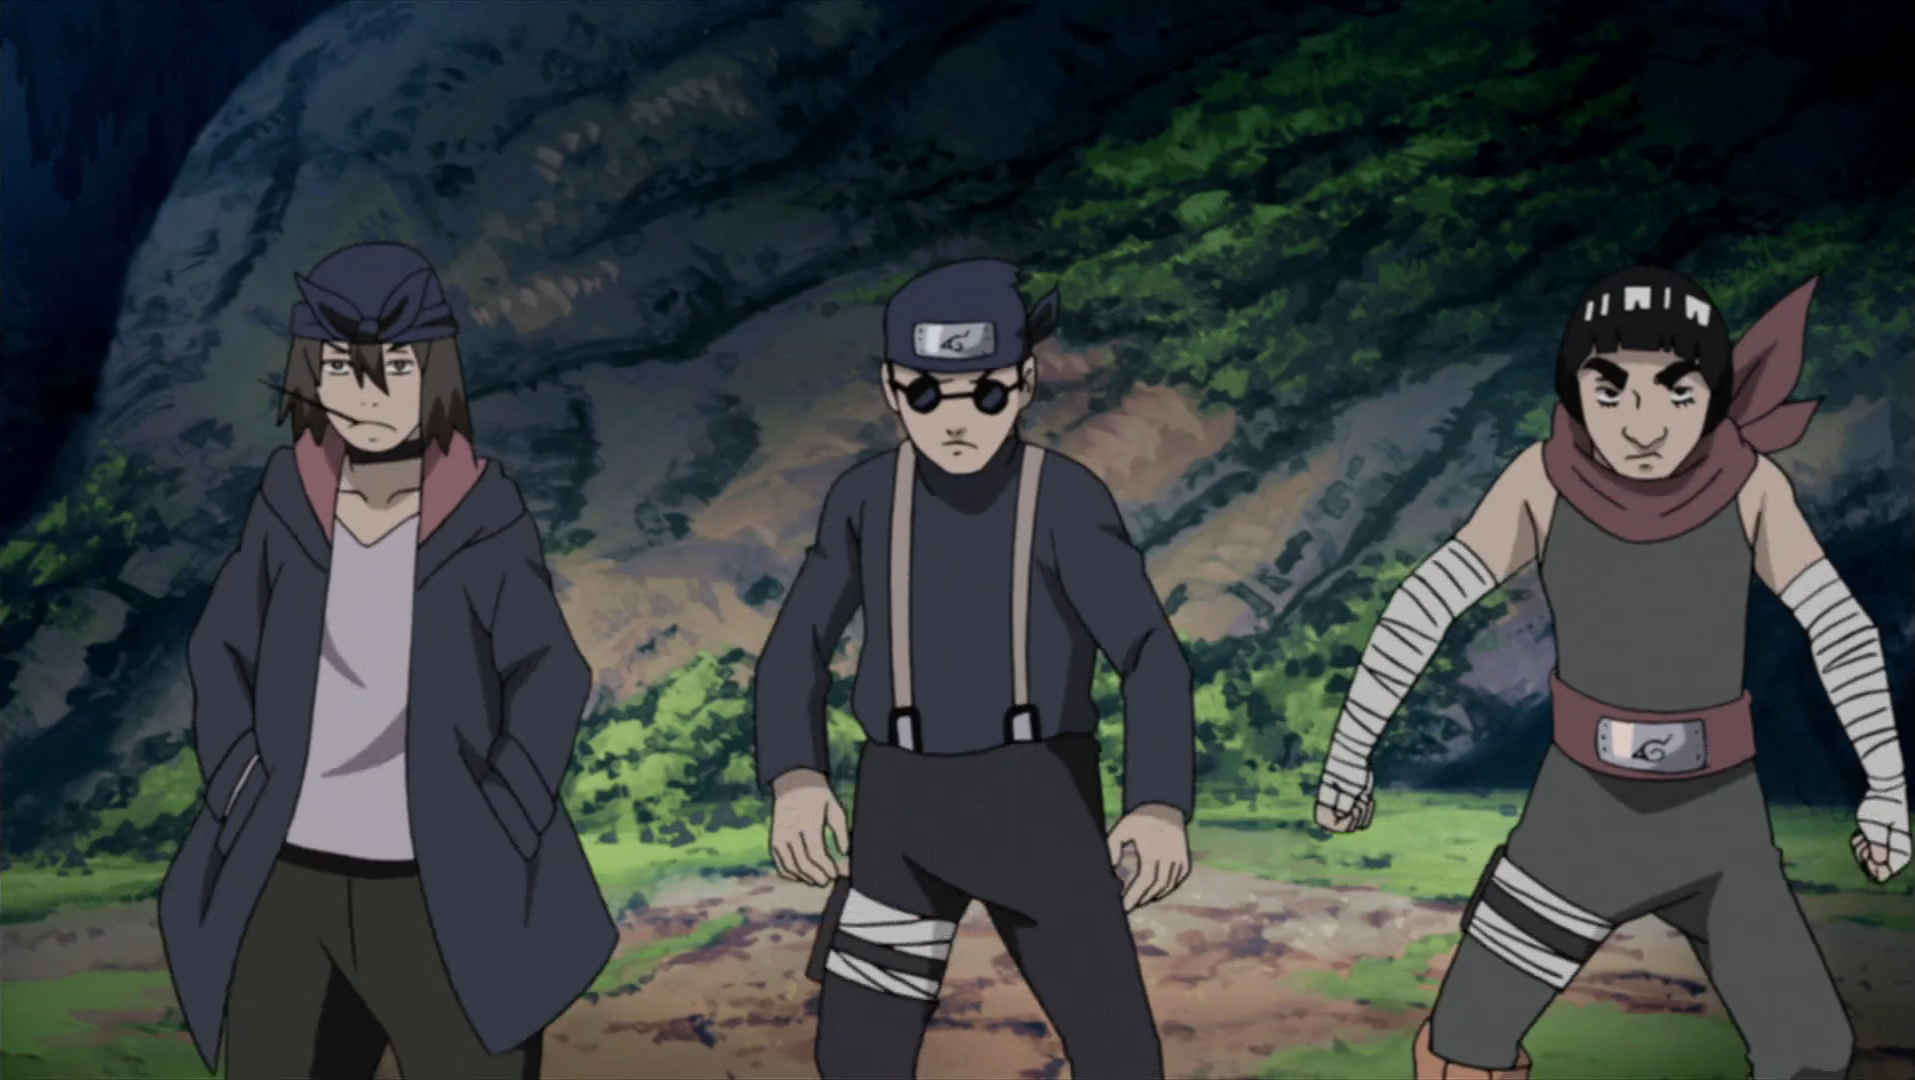 Genma Shiranui | Narutopedia | FANDOM powered by Wikia